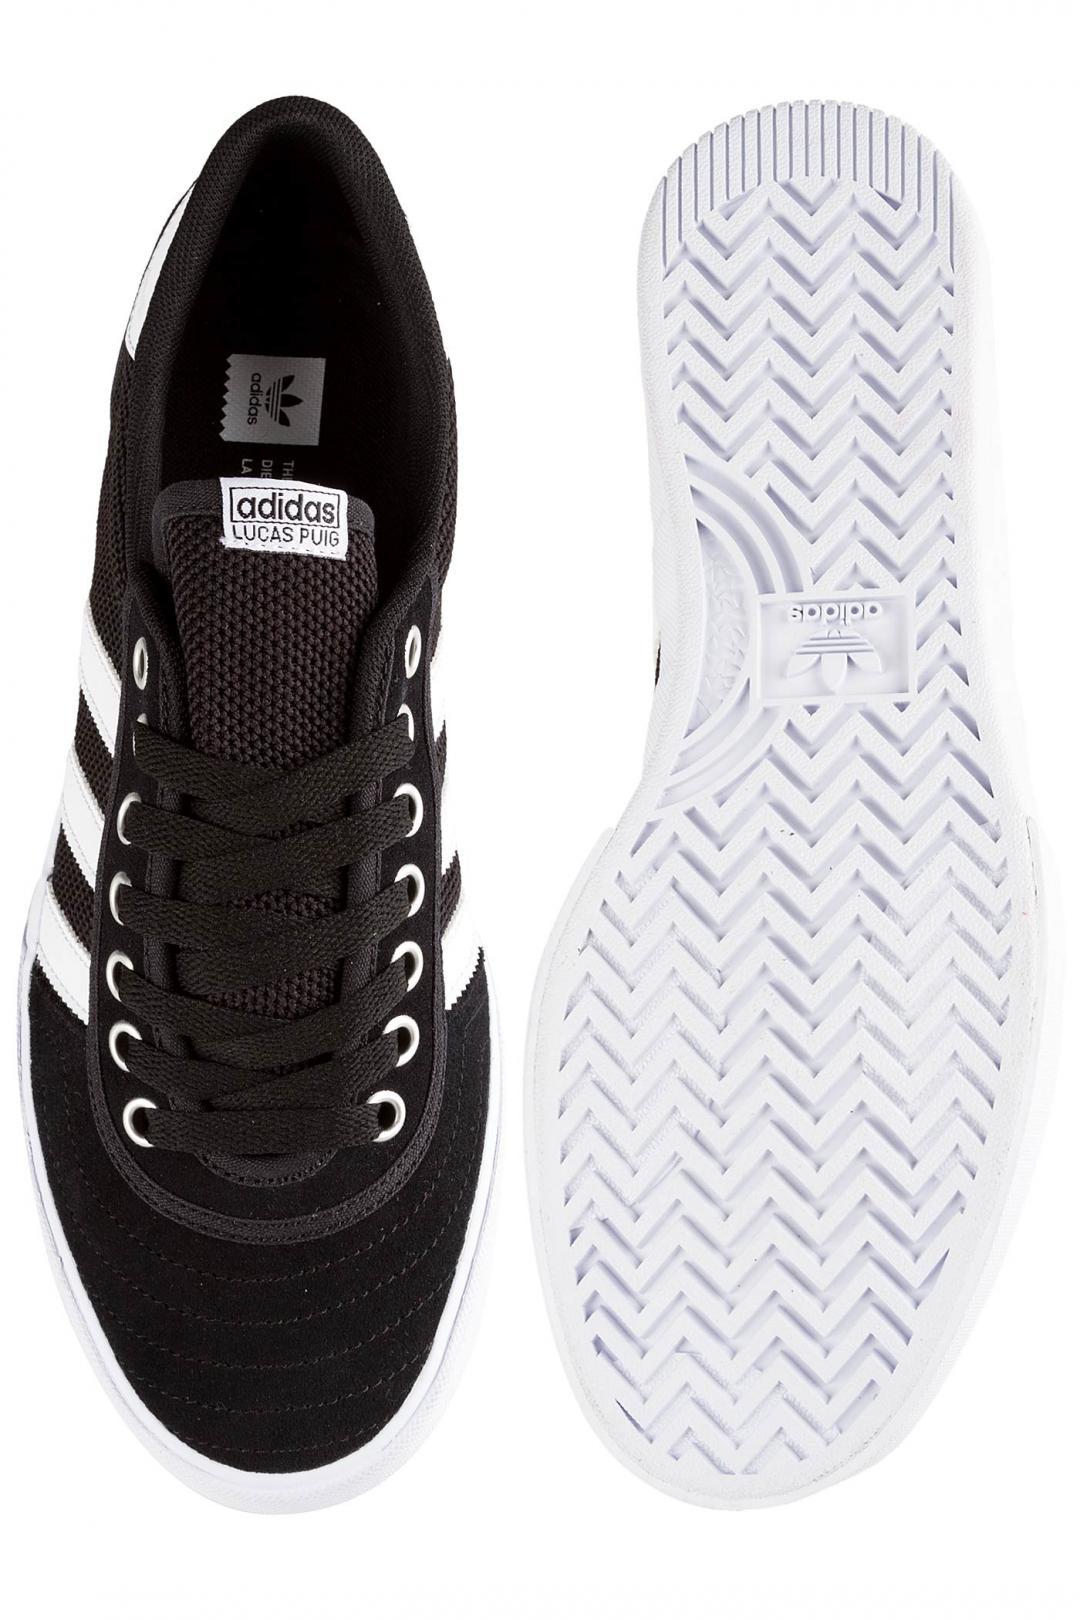 Uomo adidas Skateboarding Lucas Premiere ADV black white white | Scarpe da skate